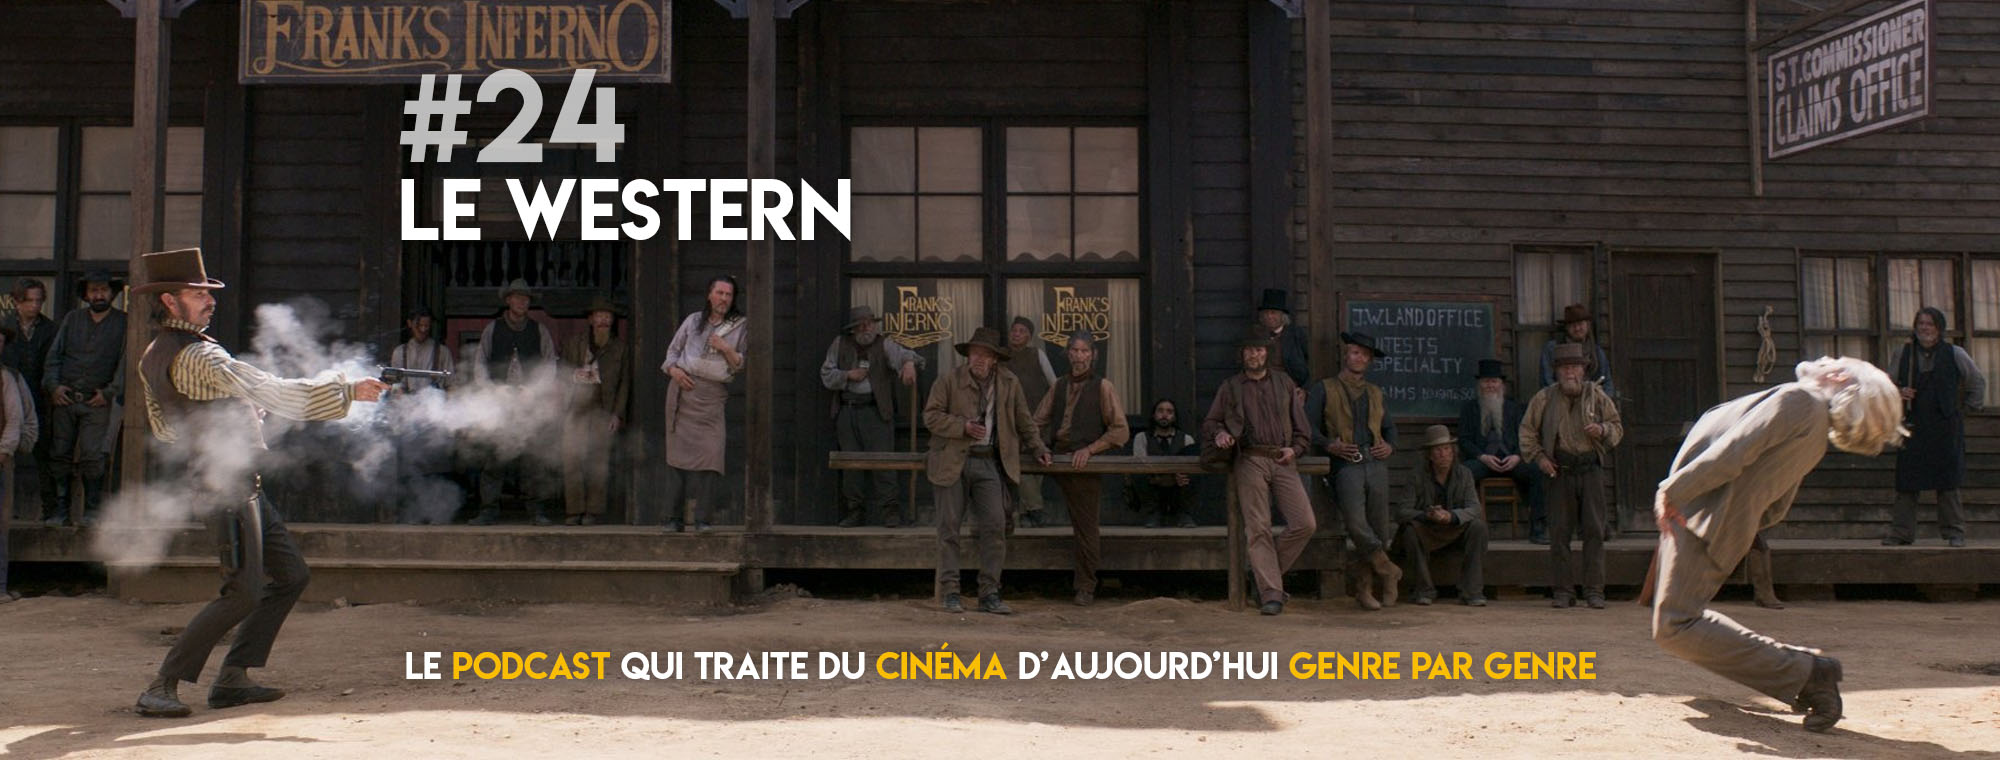 Parlons Péloches - #24 Le western